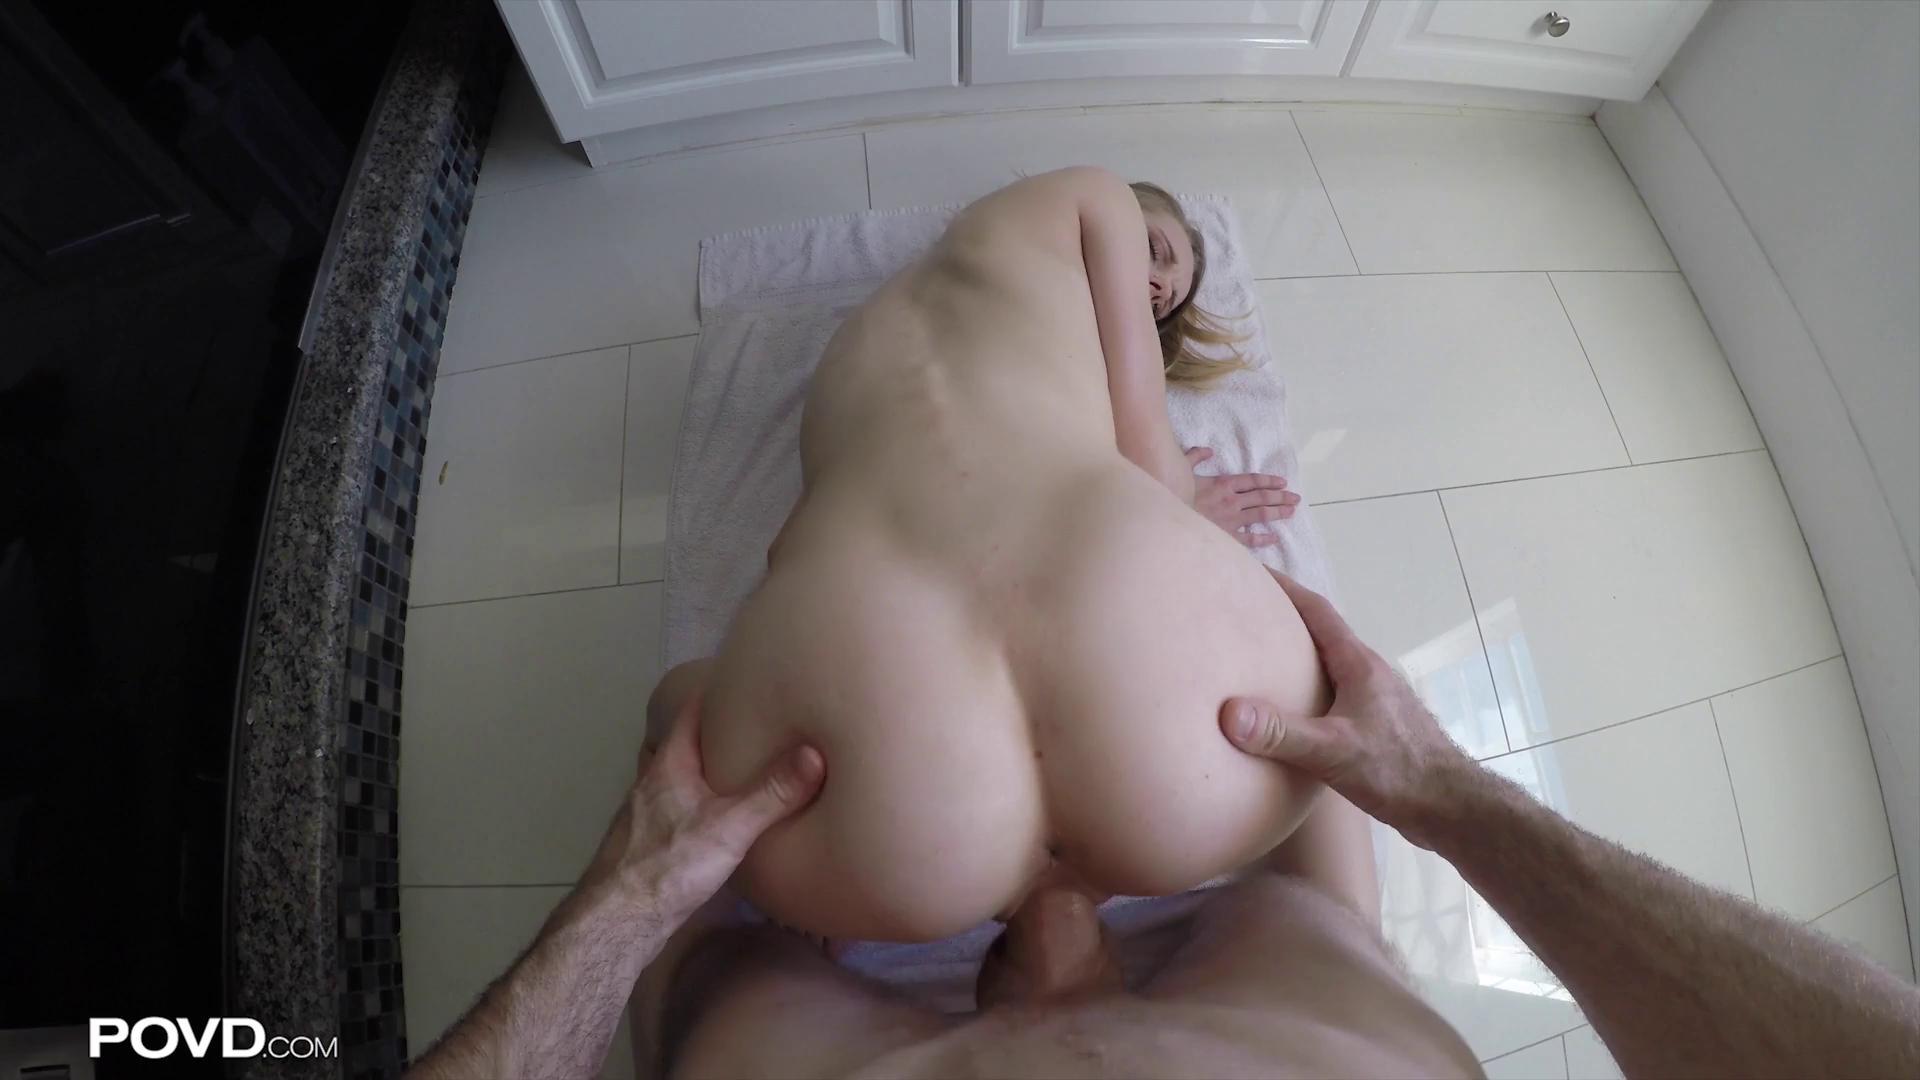 POVD – Catarina Petrov Shower Sex